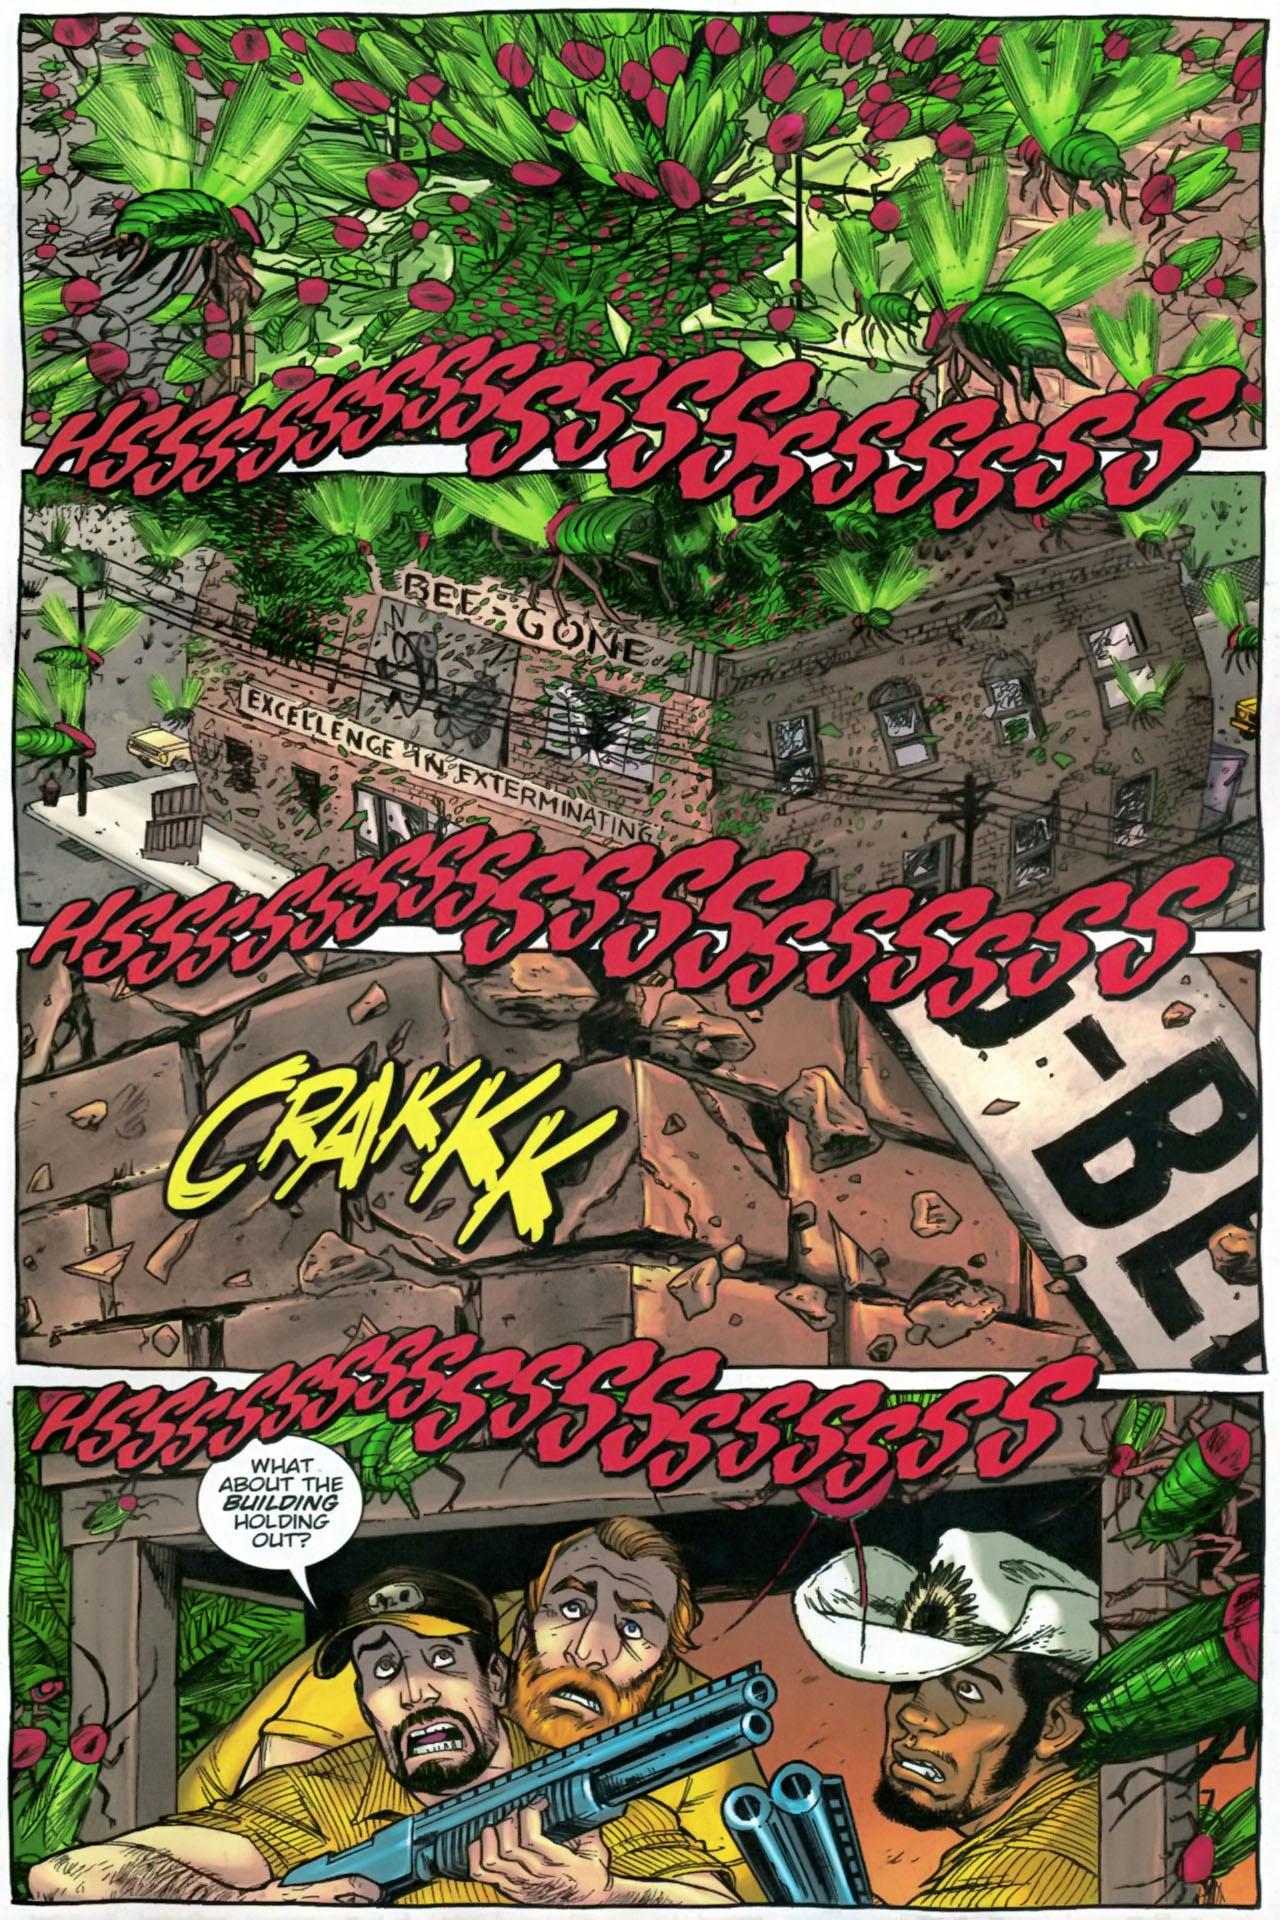 Read online The Exterminators comic -  Issue #28 - 21